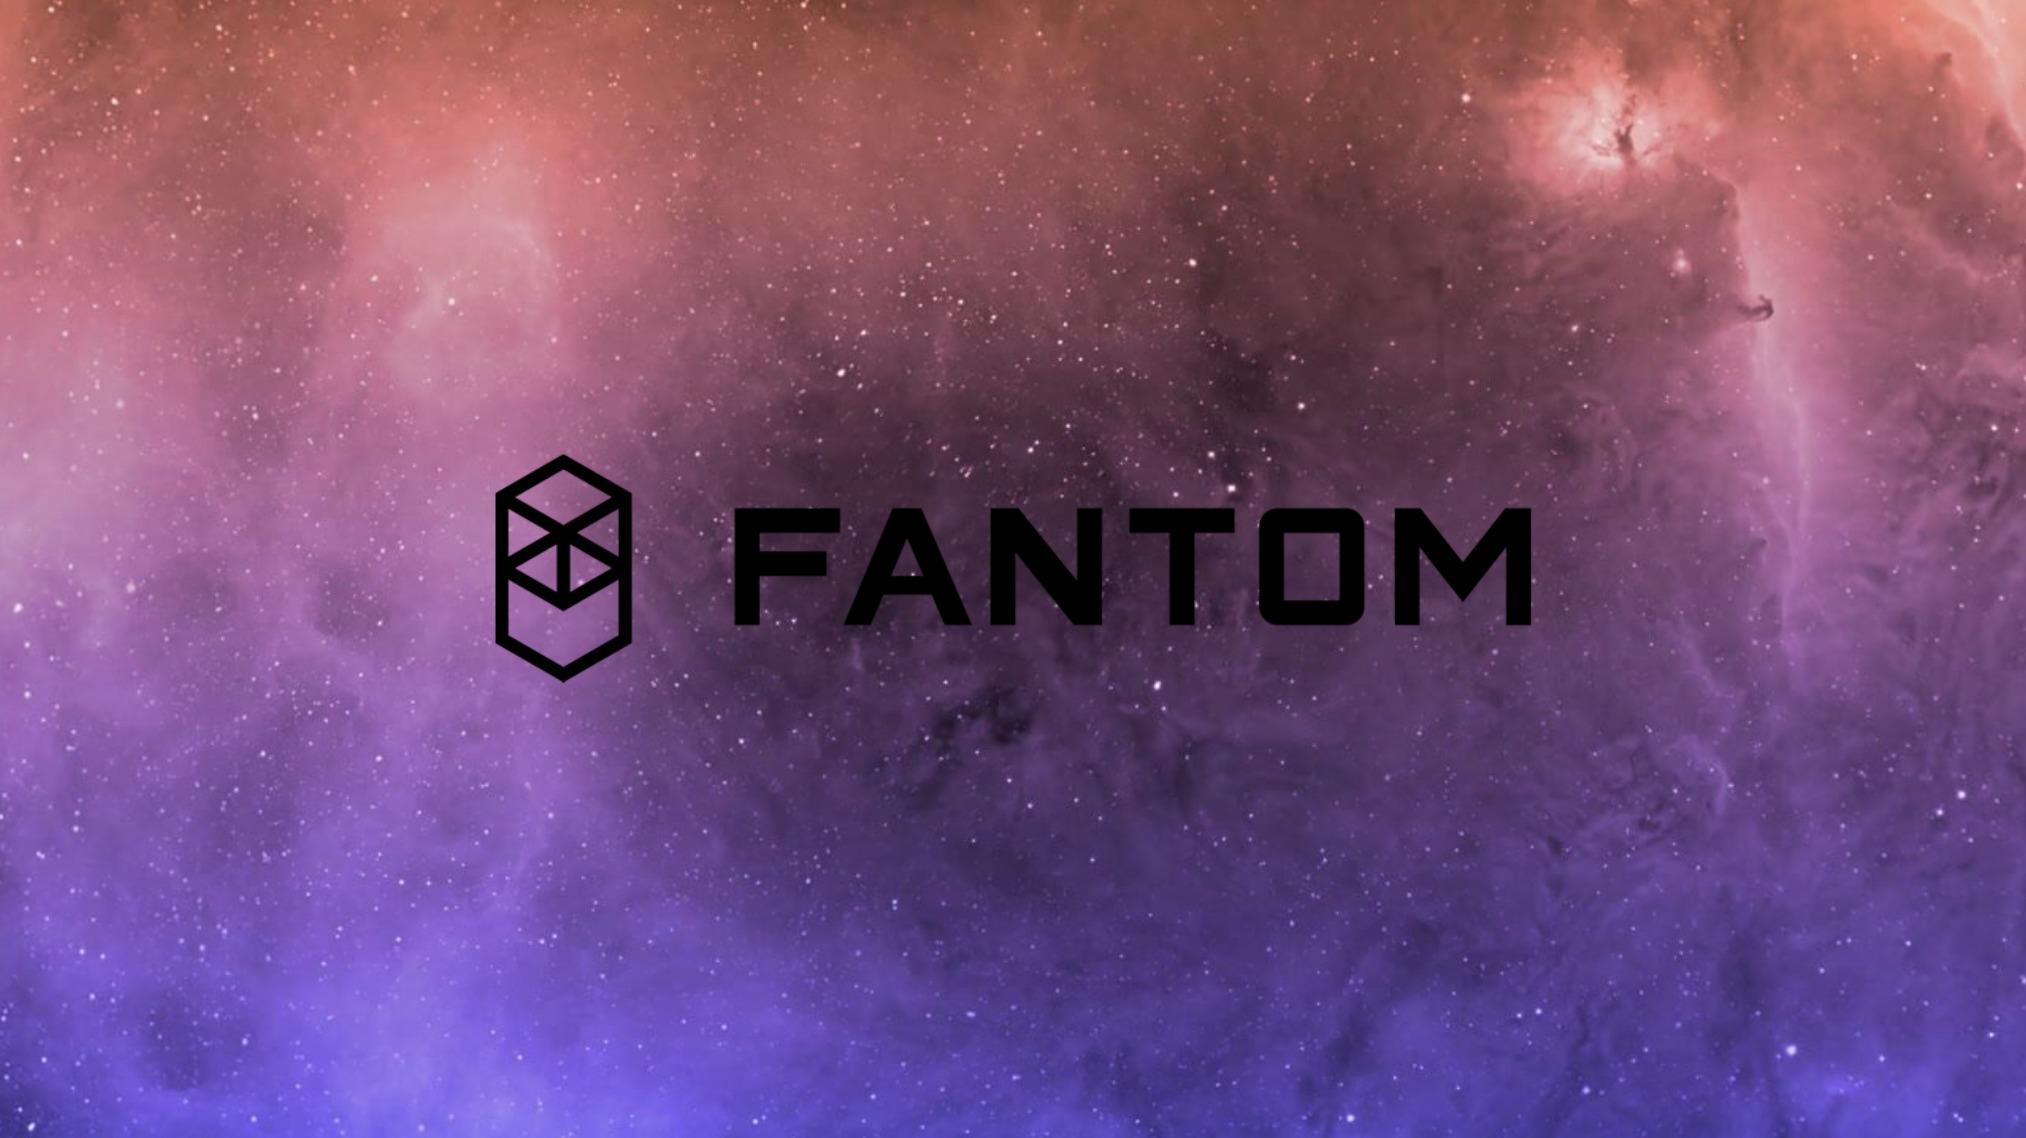 Fantomの設定方法!入金からスワップやファーミングするまで徹底解説